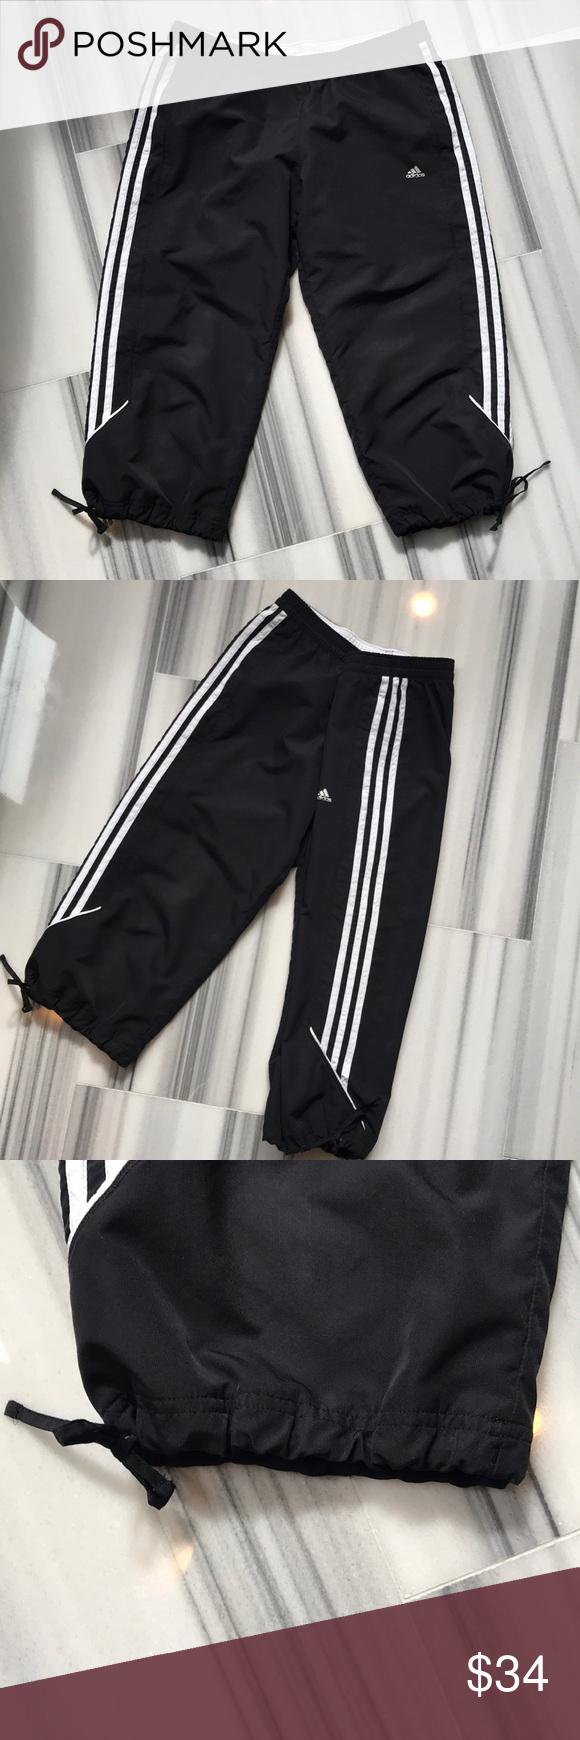 Adidas Capri track pants Size M